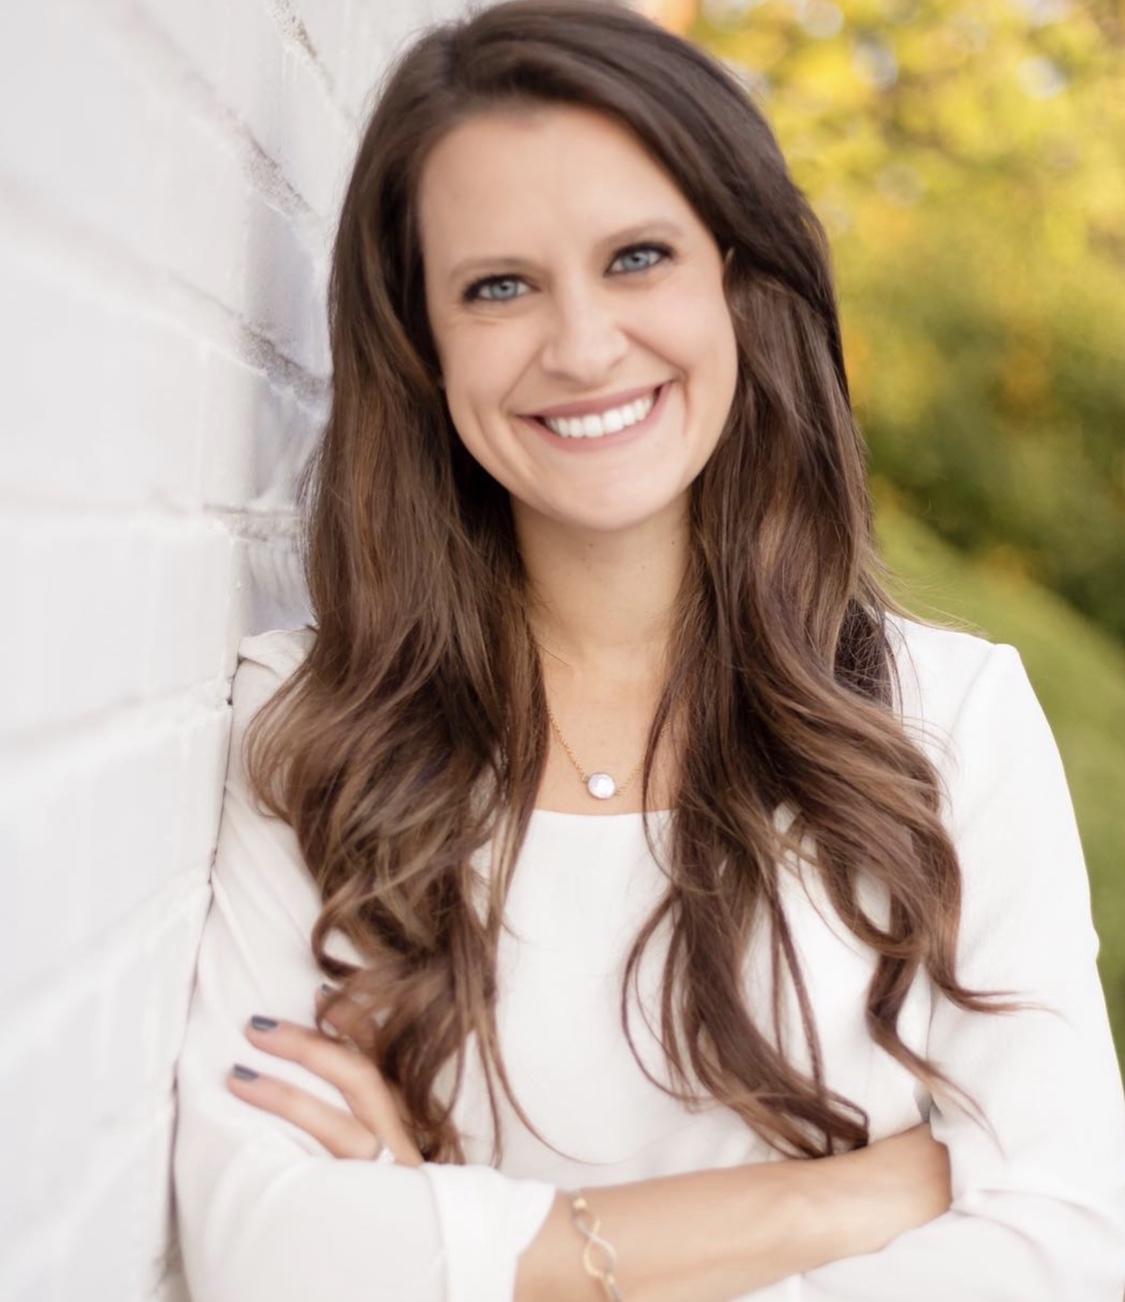 Brittany Lanehart